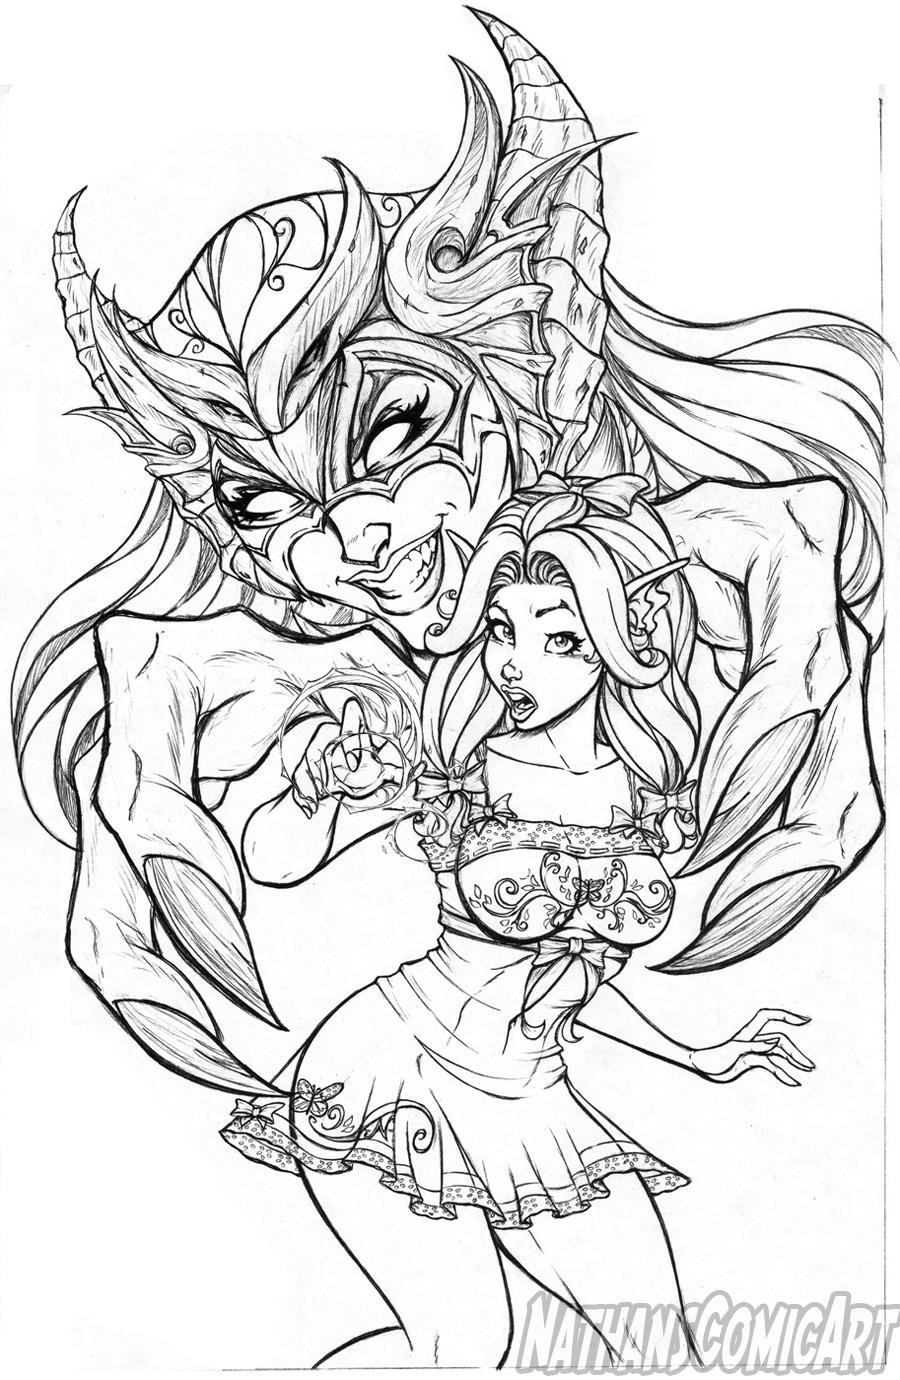 Line Art Comic : Knightingail vol cover line art by nathanscomicart